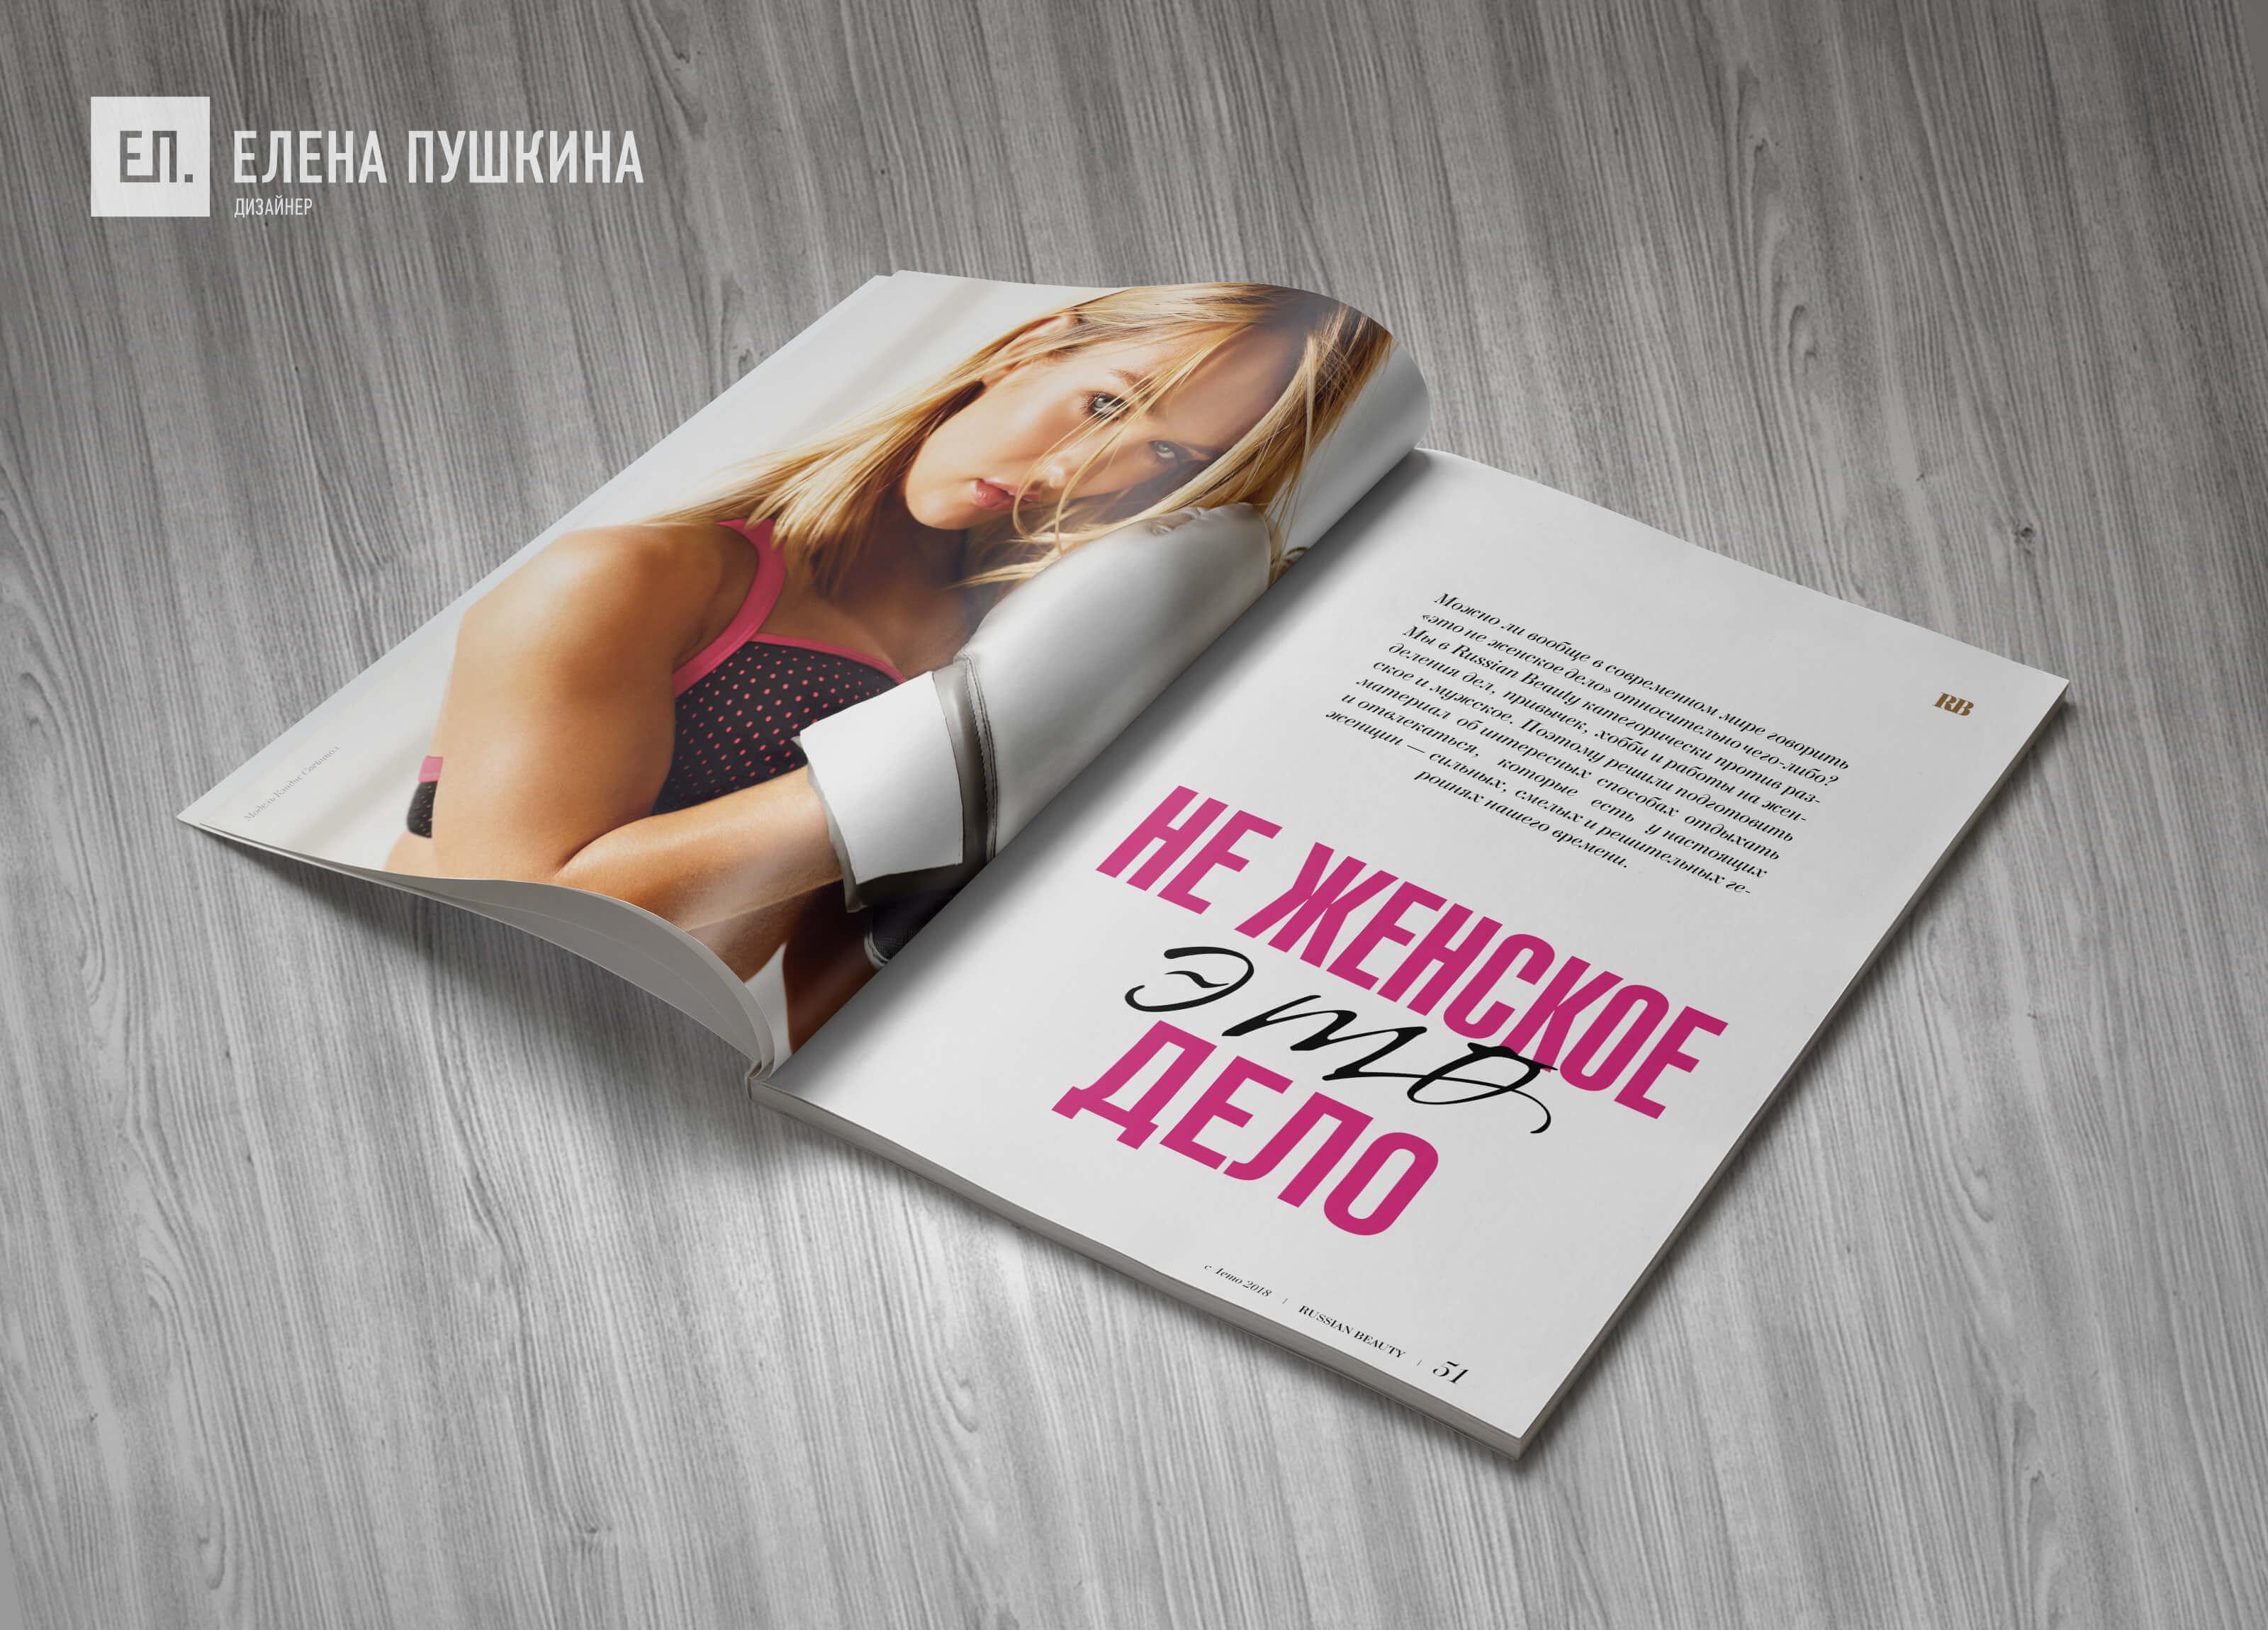 Глянцевый журнал «RUSSIAN BEAUTY» №3 август 2018— разработка с«нуля» логотипа, обложки, макета ивёрстка журнала Разработка журналов Портфолио